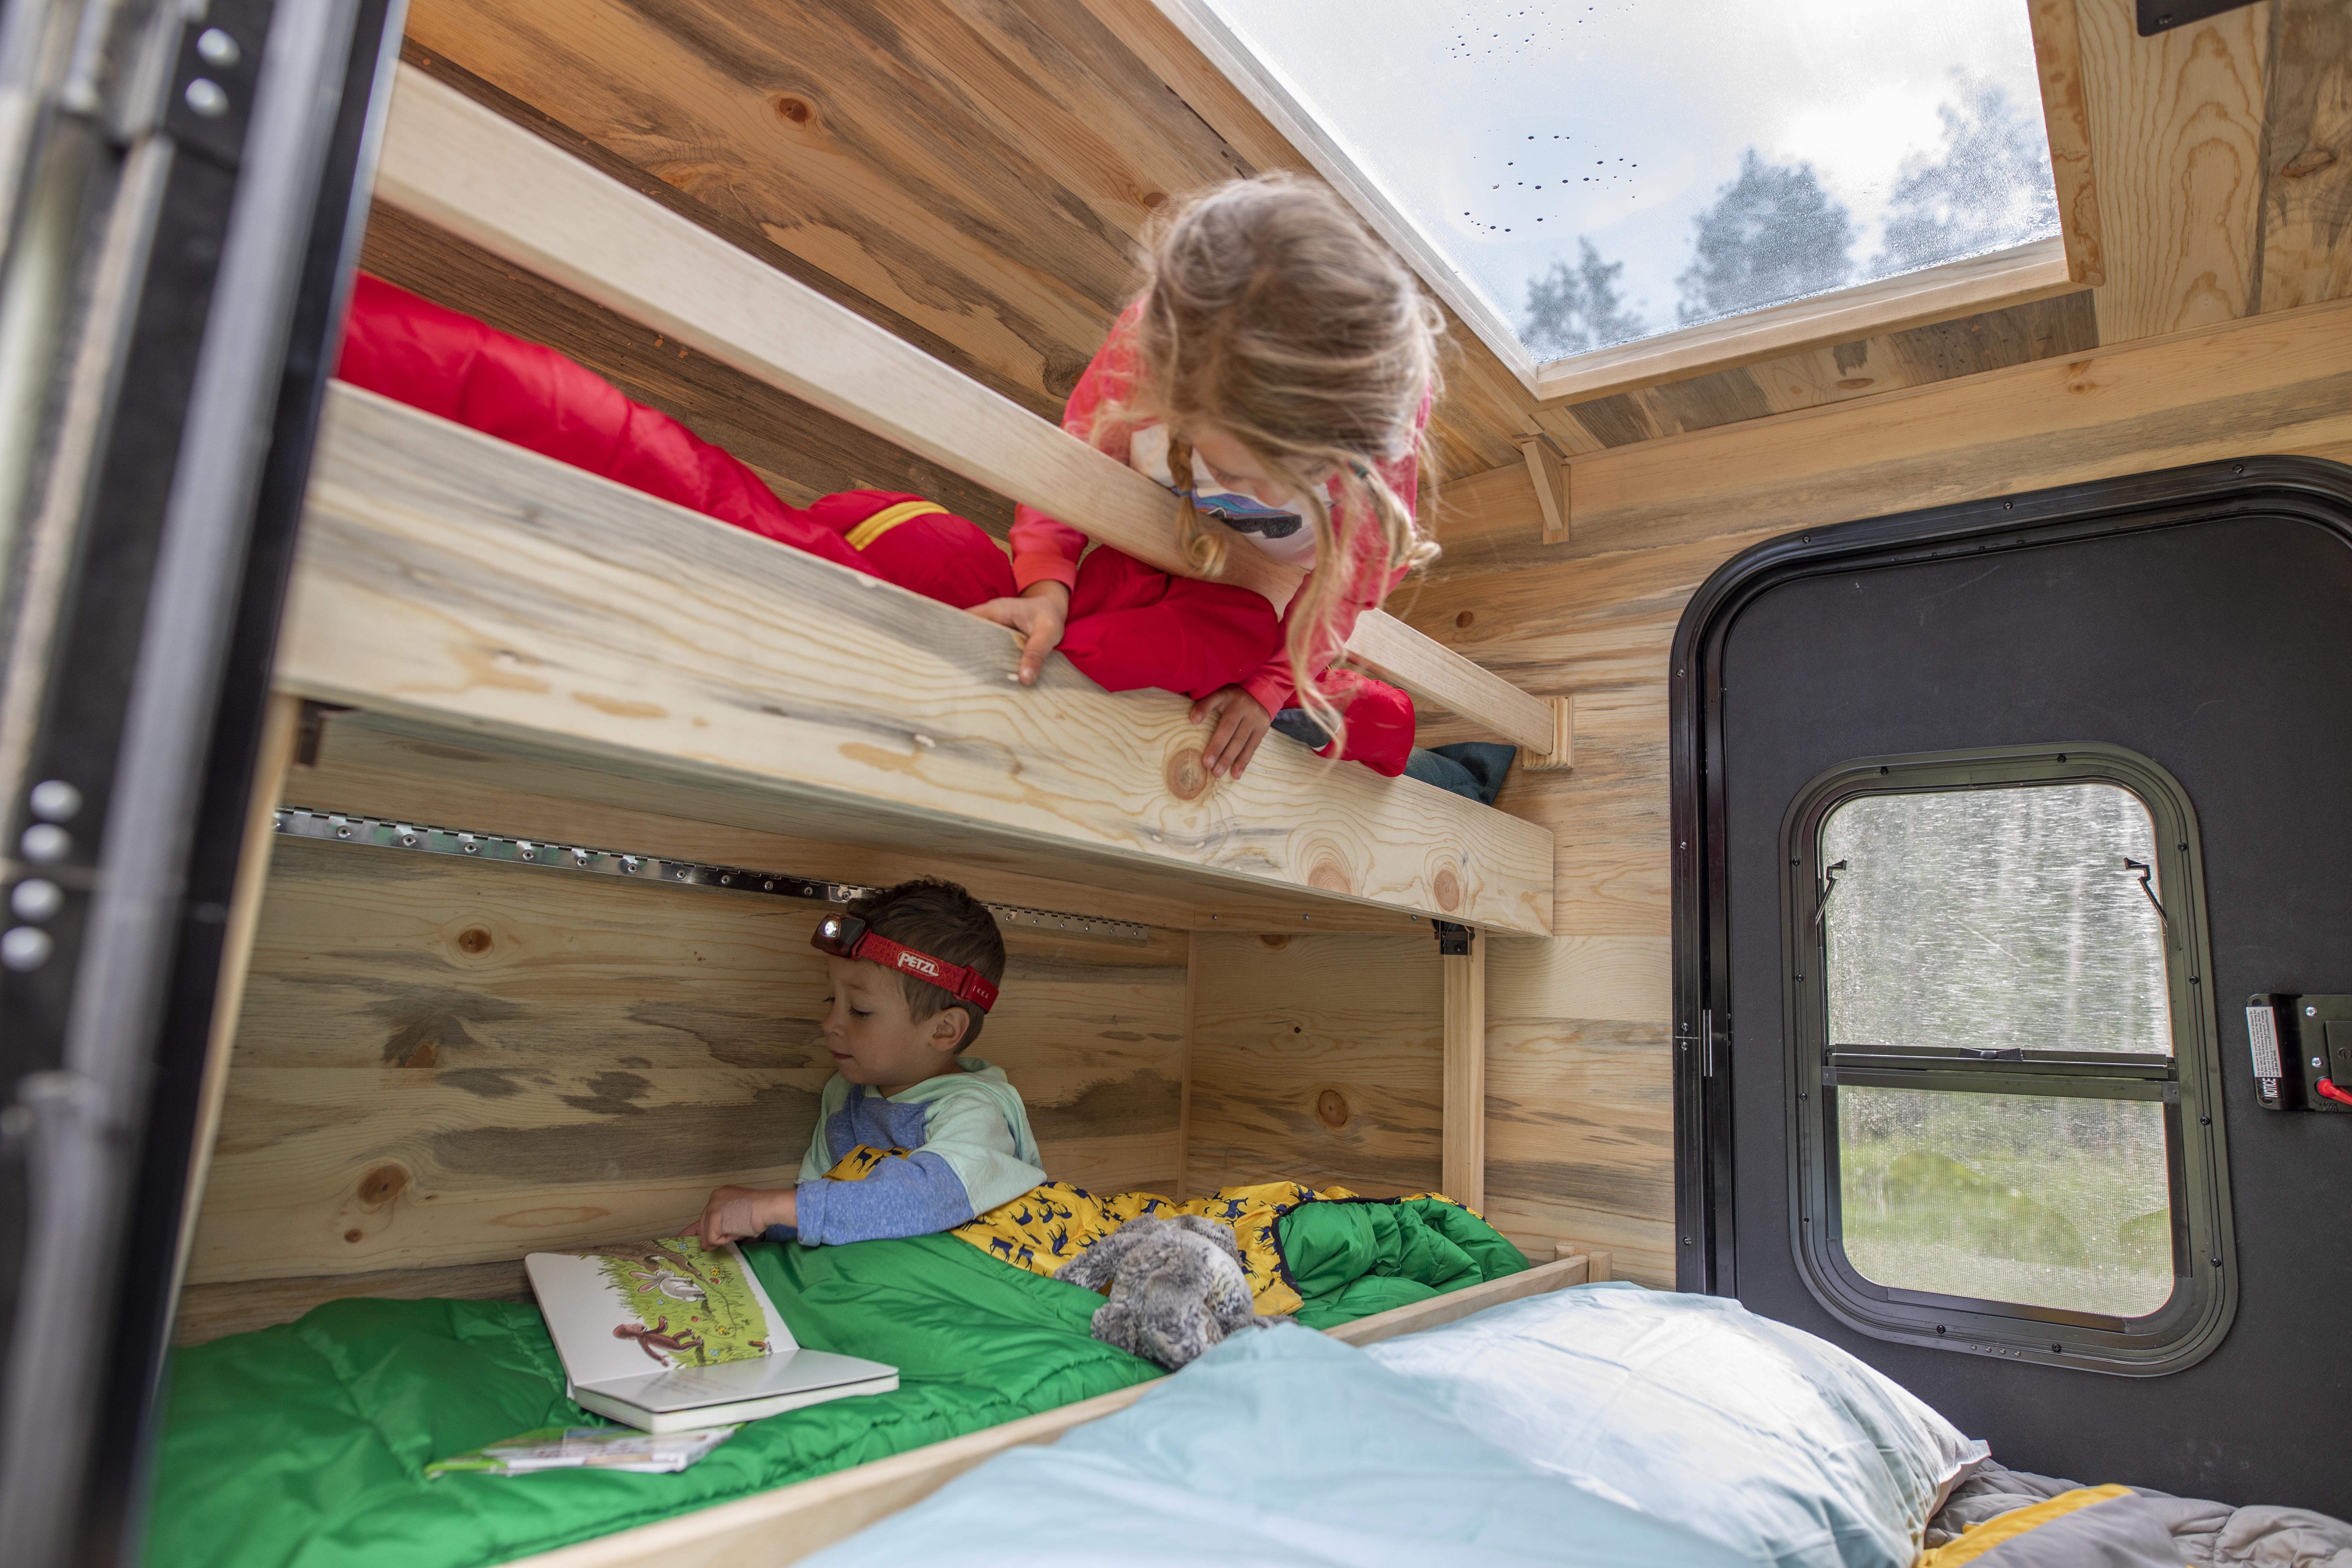 Teardrop trailer features bunkbeds to sleep a family of 4